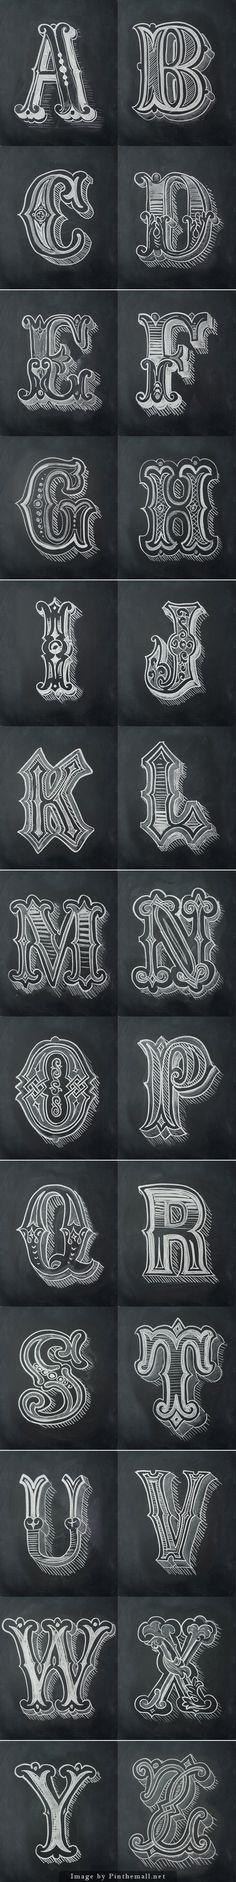 chalk alphabet, chalk lettering alphabet, antonio rodrigu, rodrigu jr, chalk design